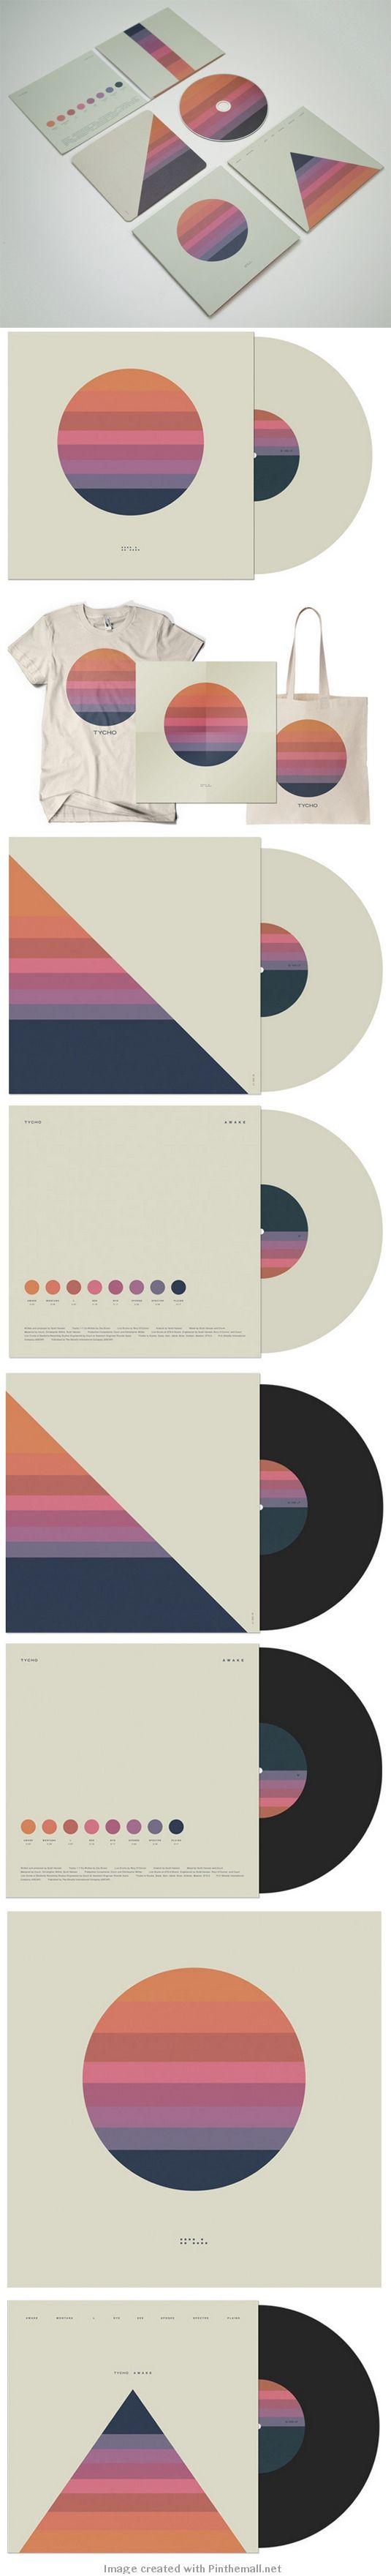 Déclinaisons des rayures sous plusieurs formes | Tycho Awake | Scott Hansen, Graphic Designer and Musician